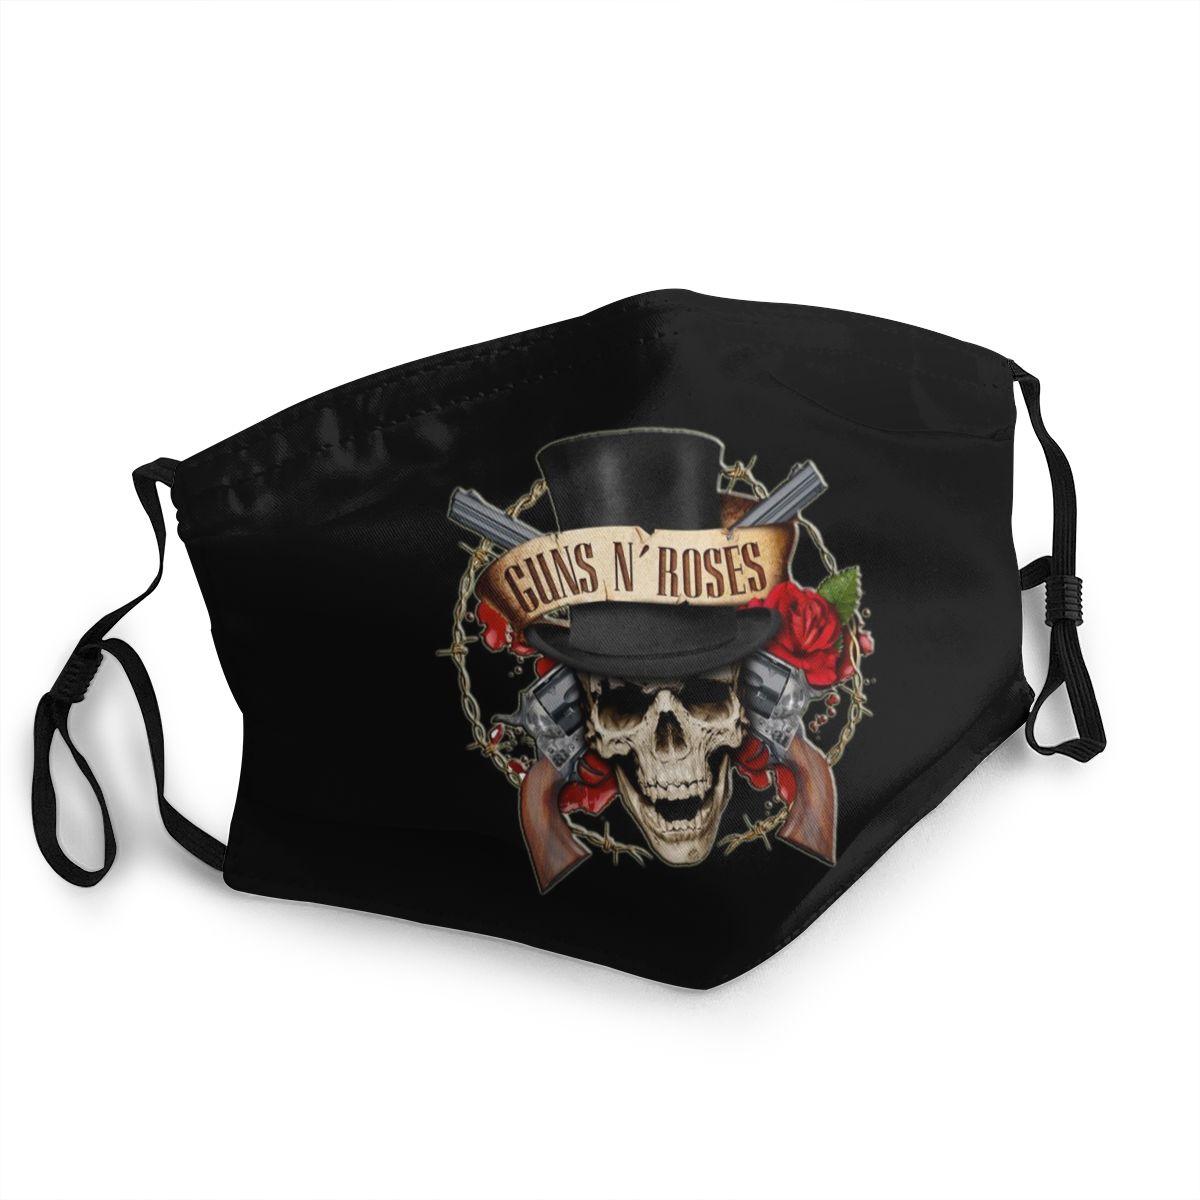 2020 New Guns N Roses Pm2.5 Filter Dust Mouth Mask Hip Hop Women/men Filter Mouth Foam Mask Guns Slash Ladies/mens Mask